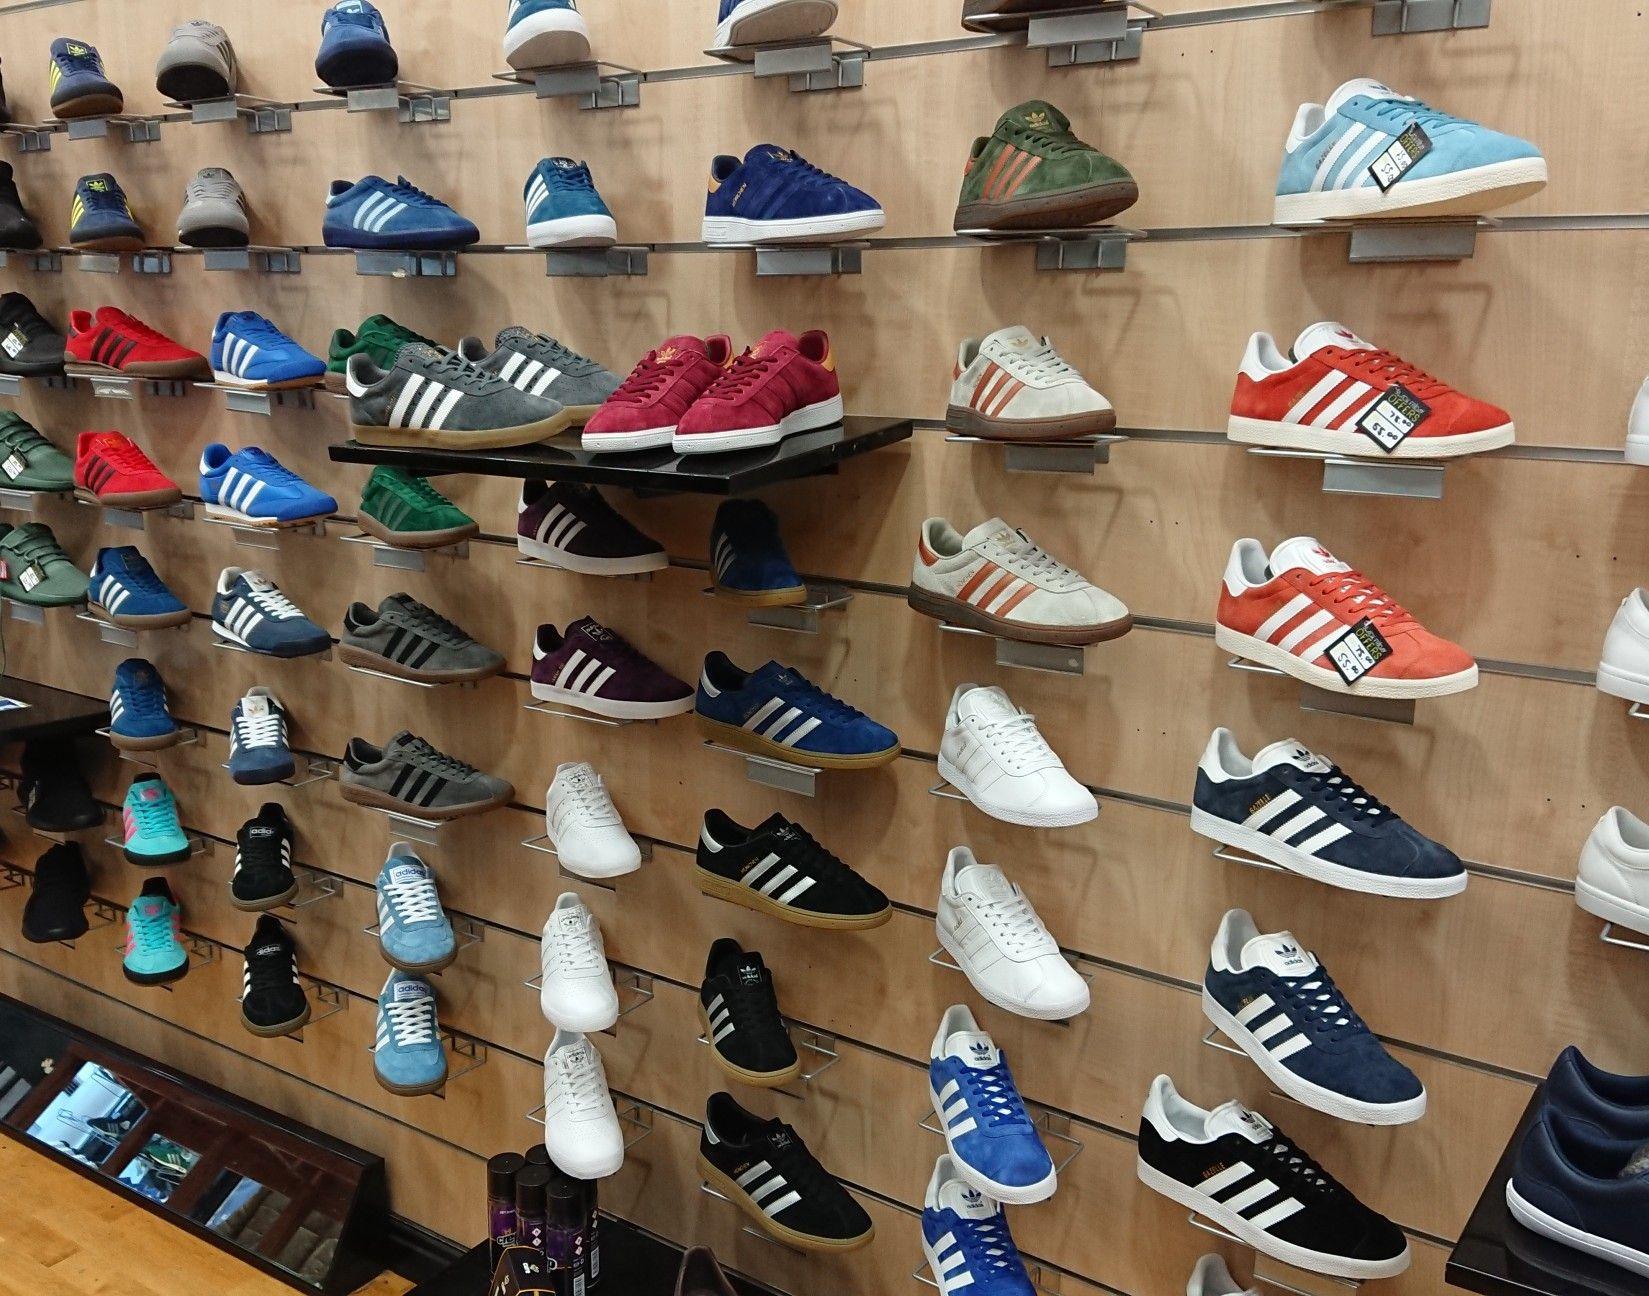 Football casuals, Adidas gazelle